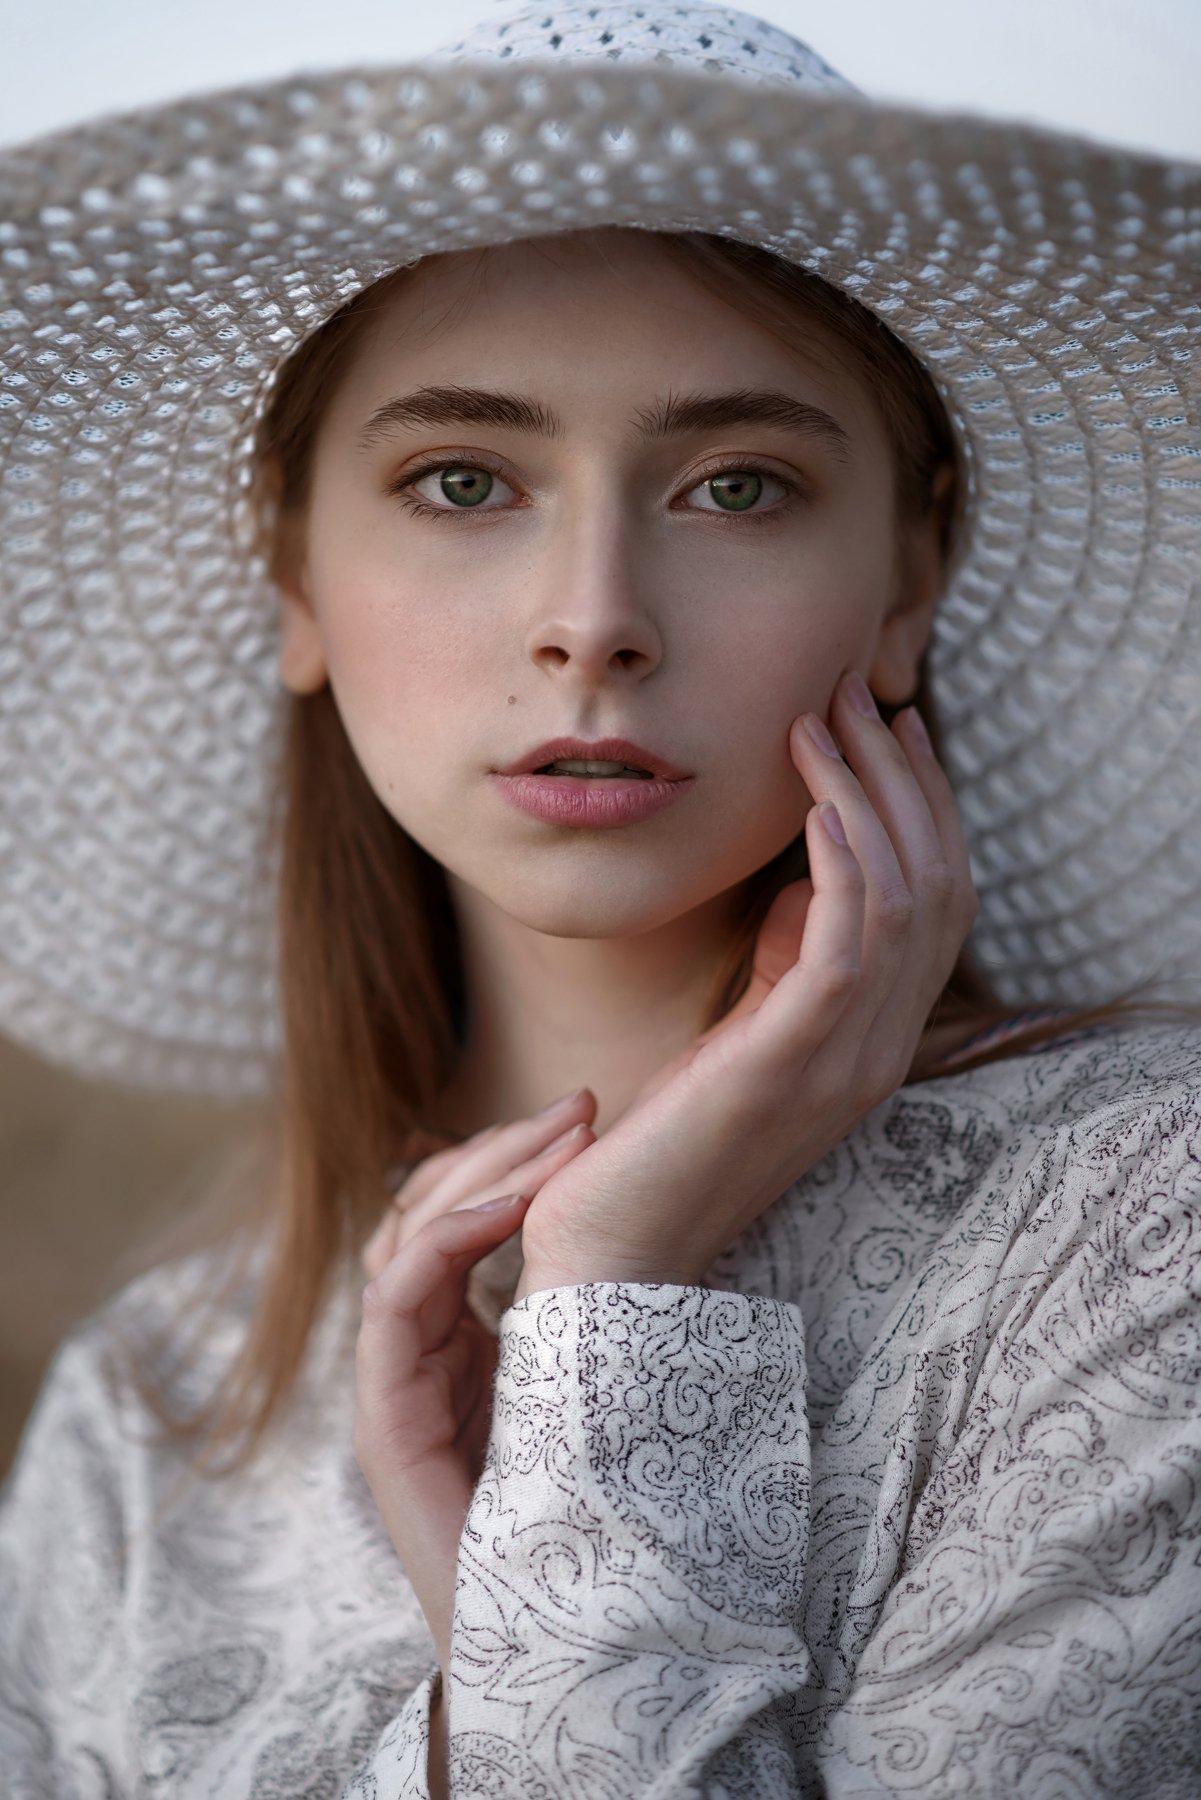 portrait, girl, model, eyes, hair, lips, face, beauty, facial, make-up, photographer, russia, nikon, Анна Дегтярёва